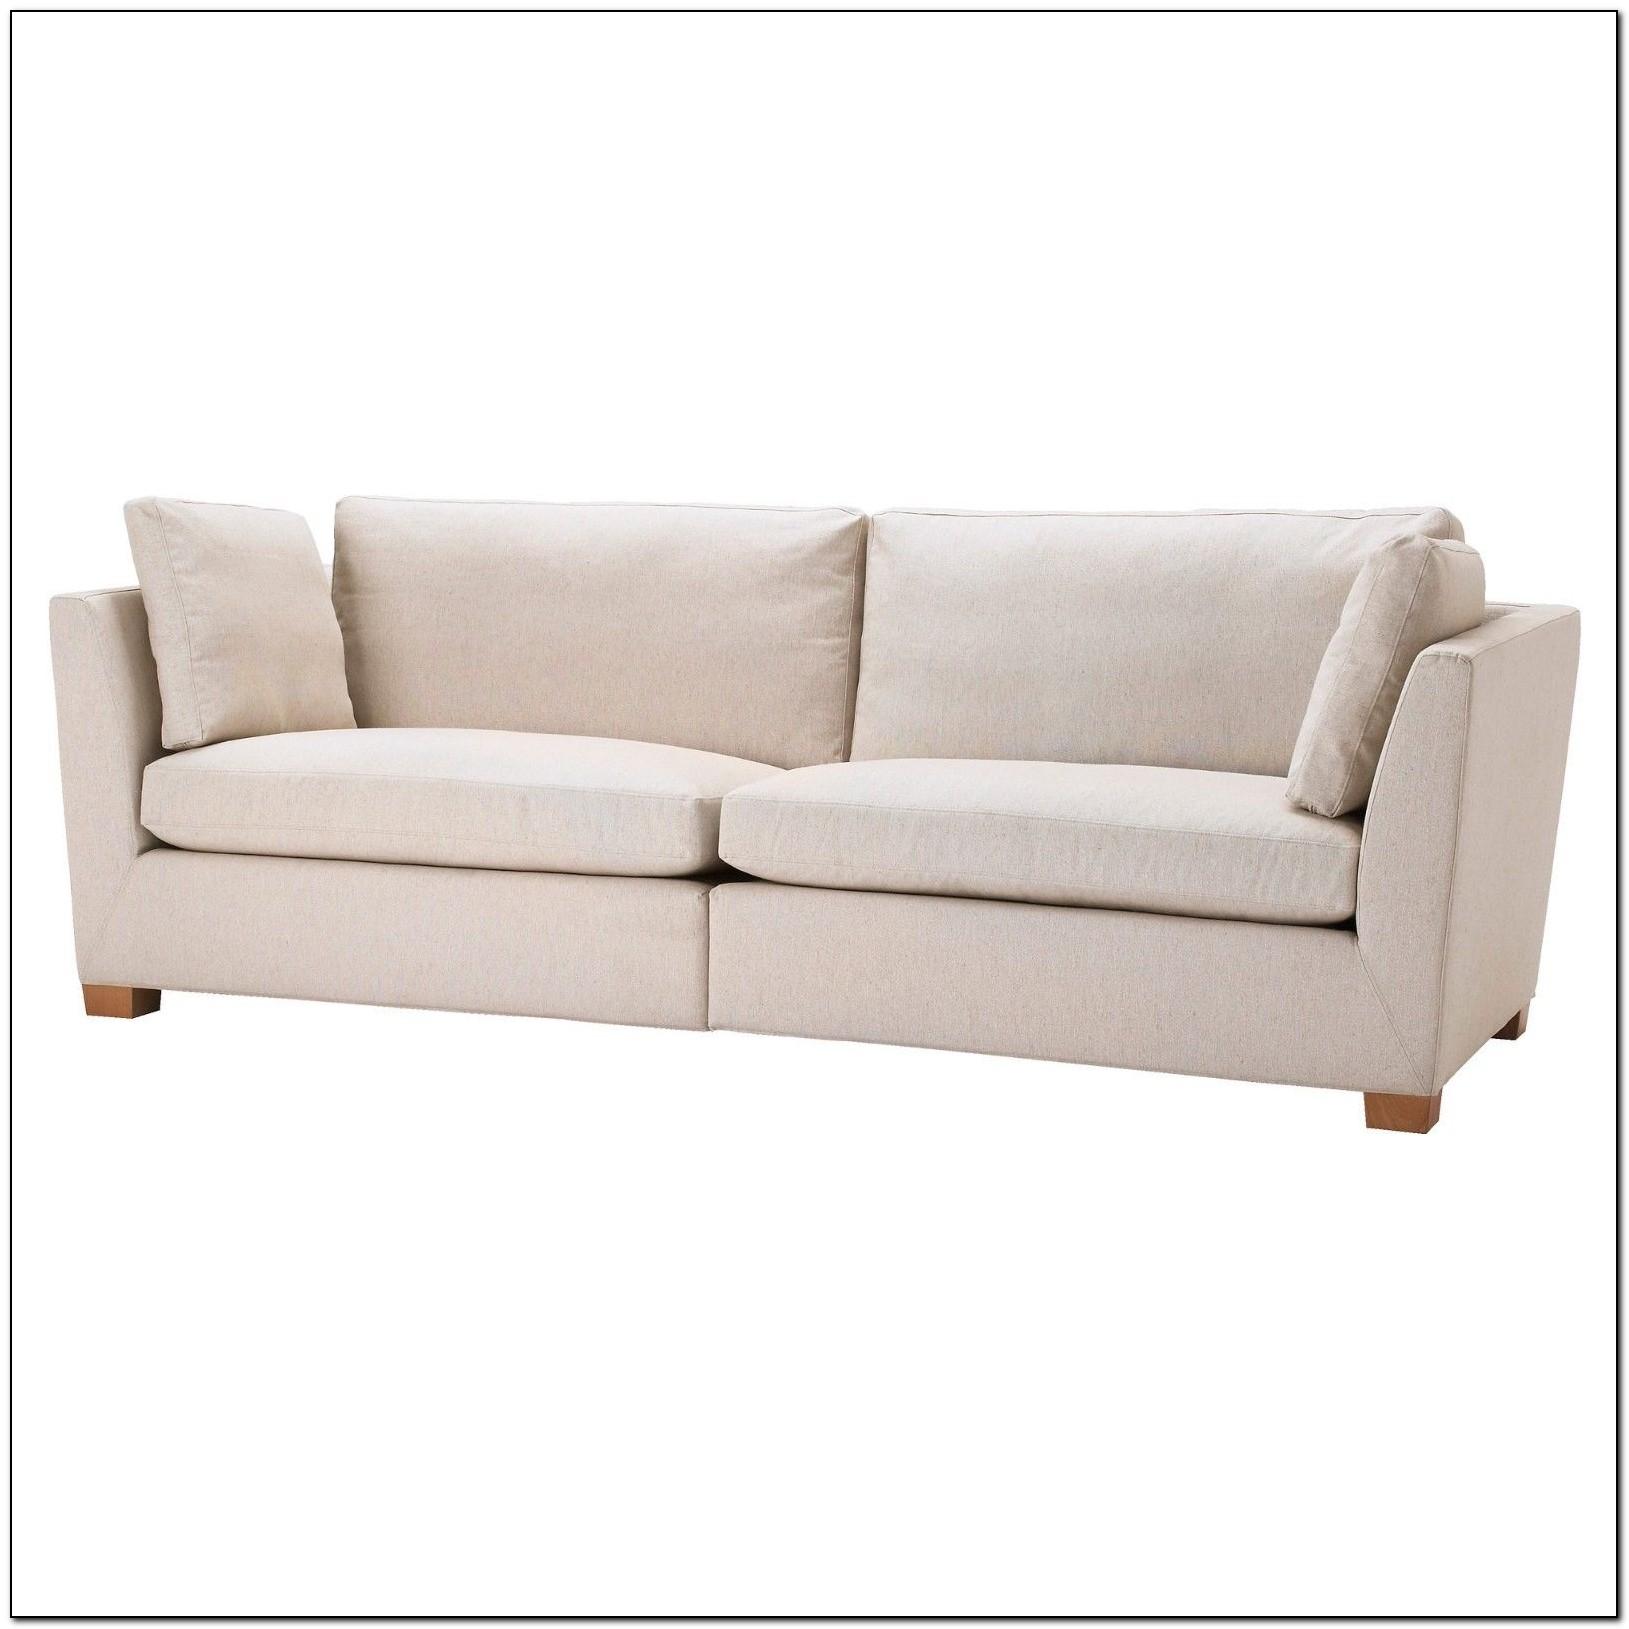 sofa slipcovers ikea sofa home design ideas ewp80jmpyx14518. Black Bedroom Furniture Sets. Home Design Ideas